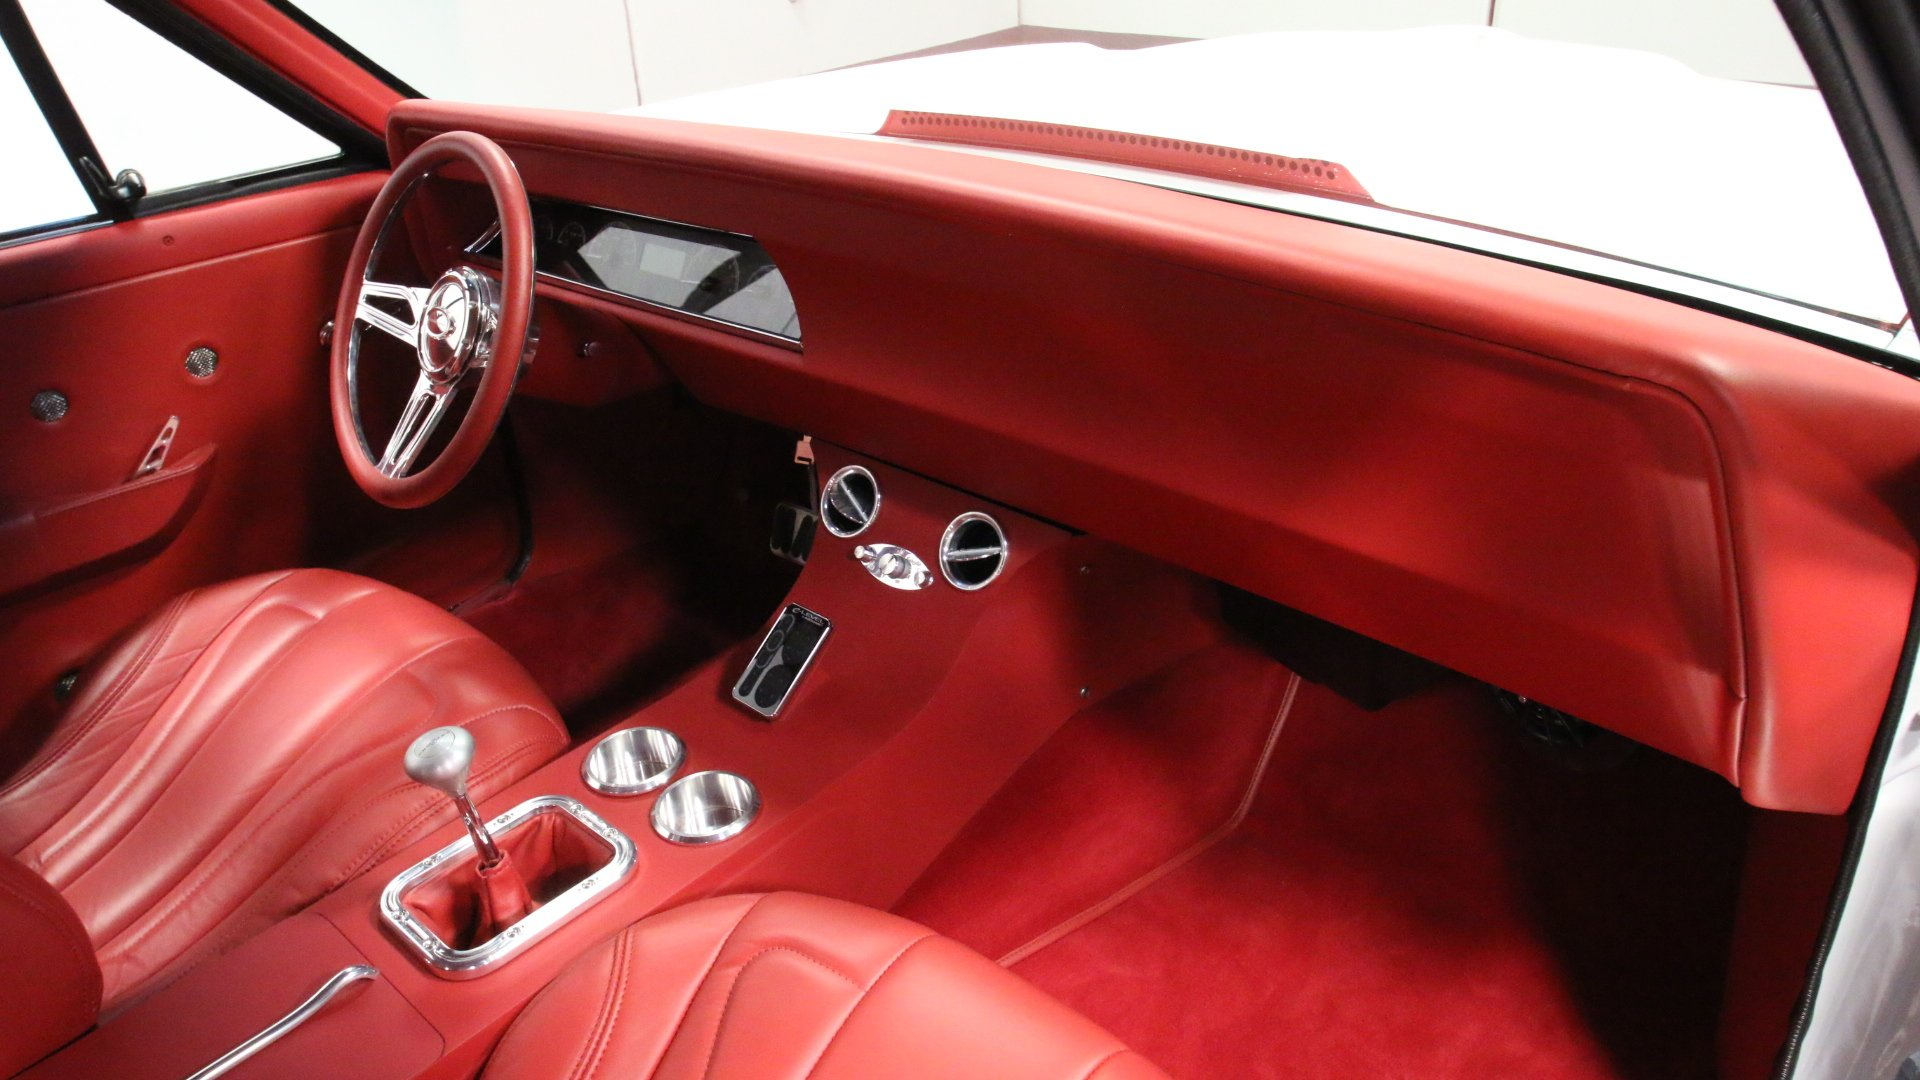 1967 Chevrolet Chevelle Malibu Restomod for sale #64014   Motorious